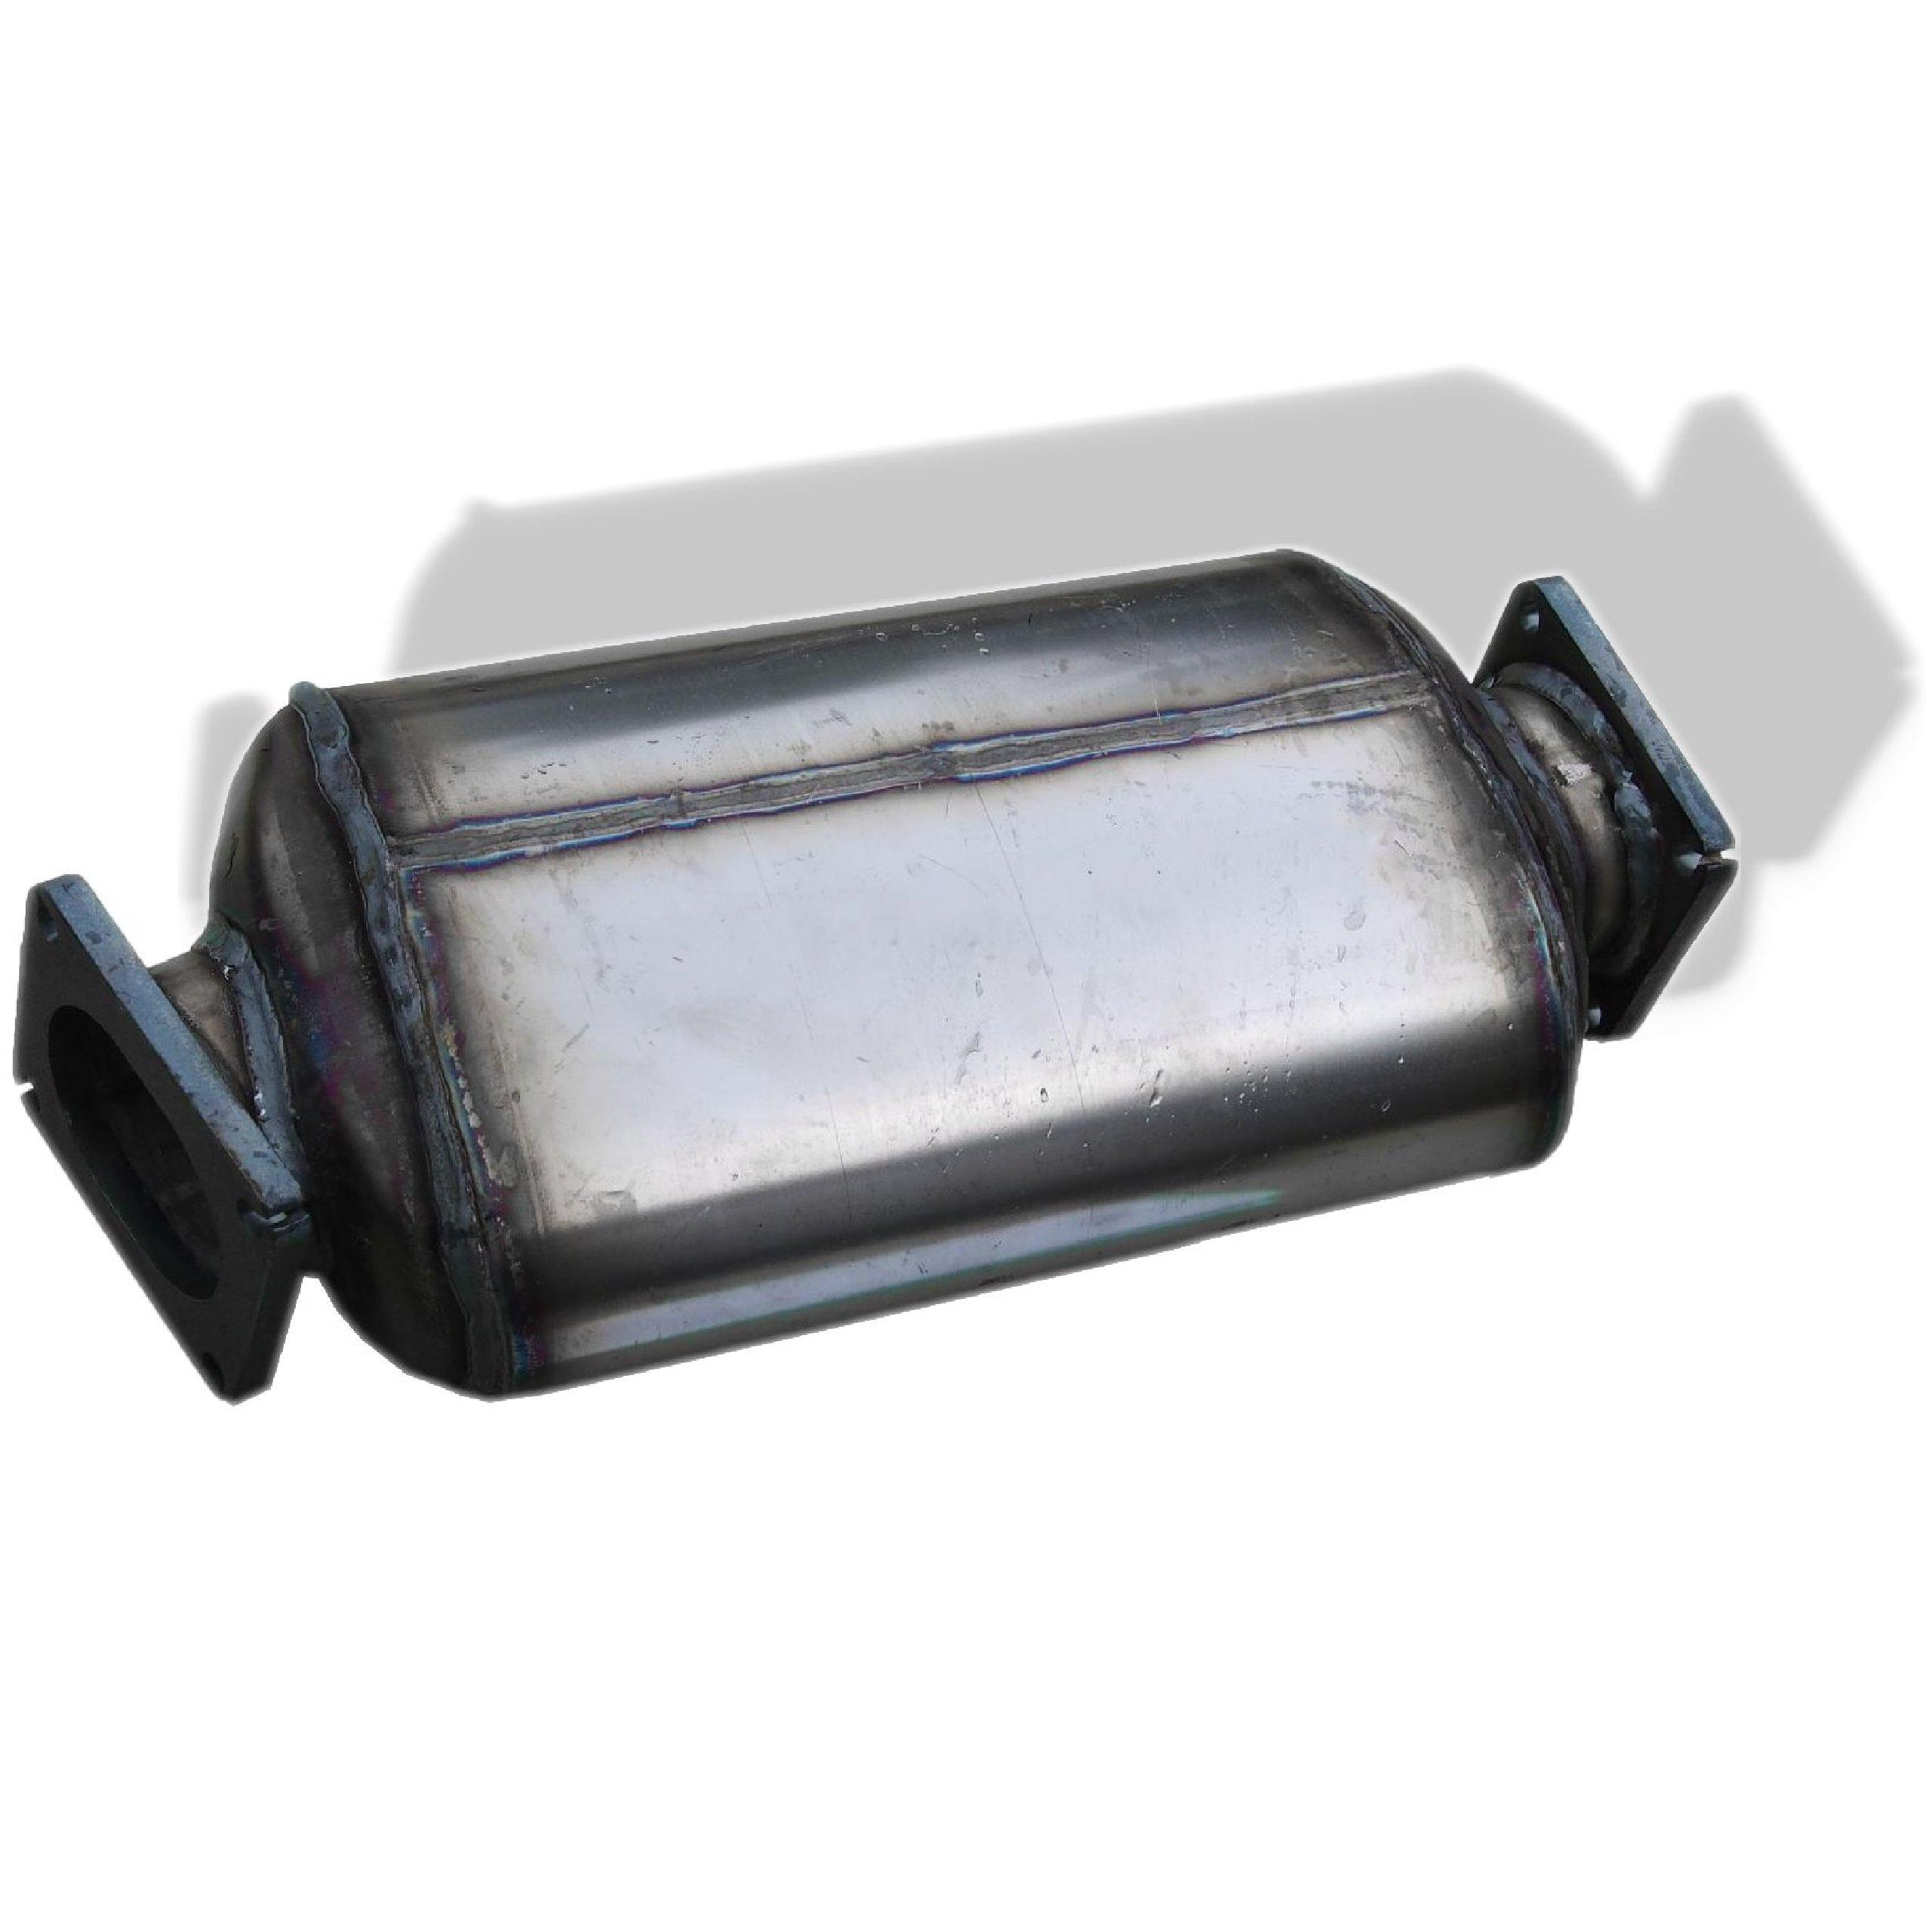 фильтр dpf fap палач bmw 530d 525d x5 e60 e53 хит